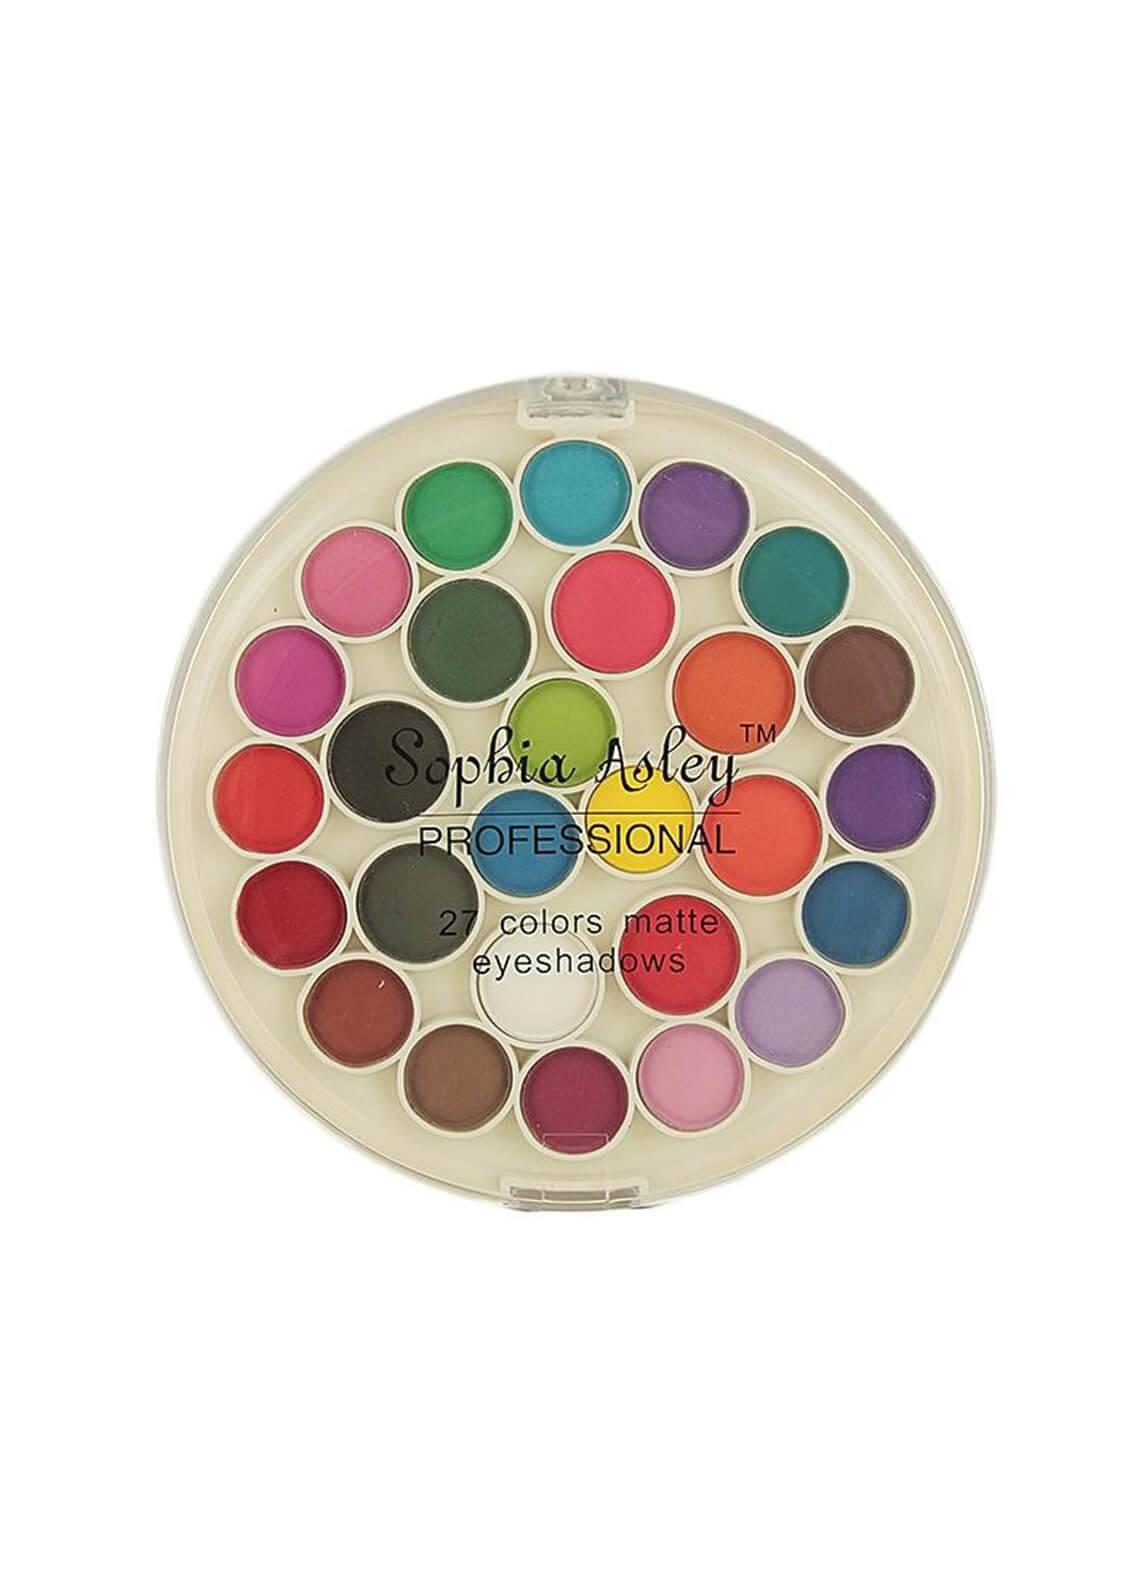 Sophia Asley Eye Shadow 27 Colors  - Matte